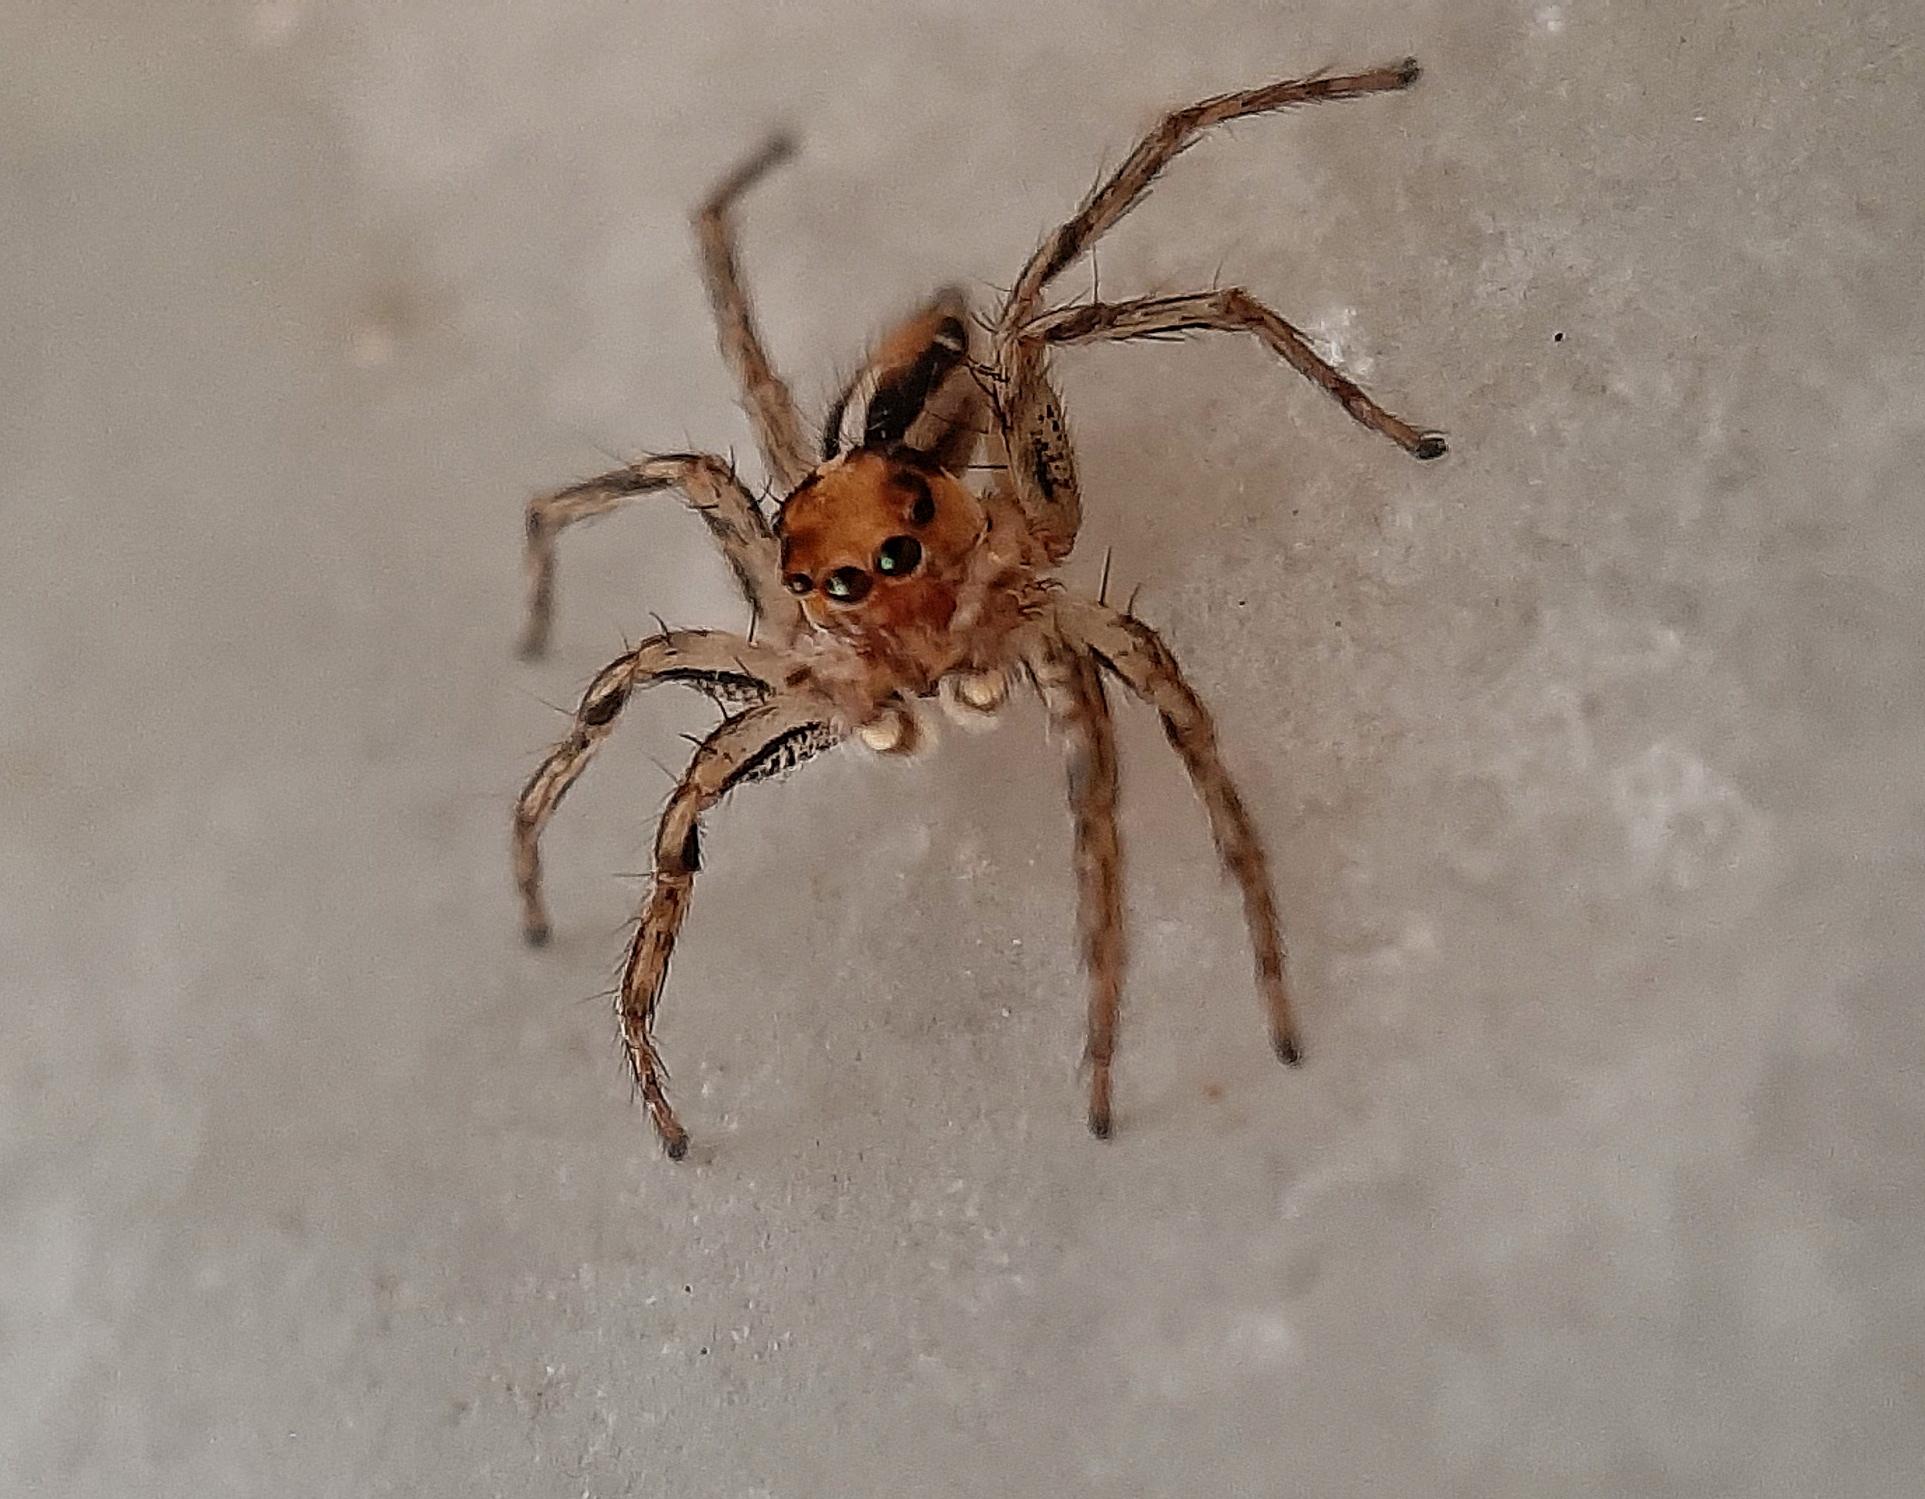 Macro shot of a jumping spider